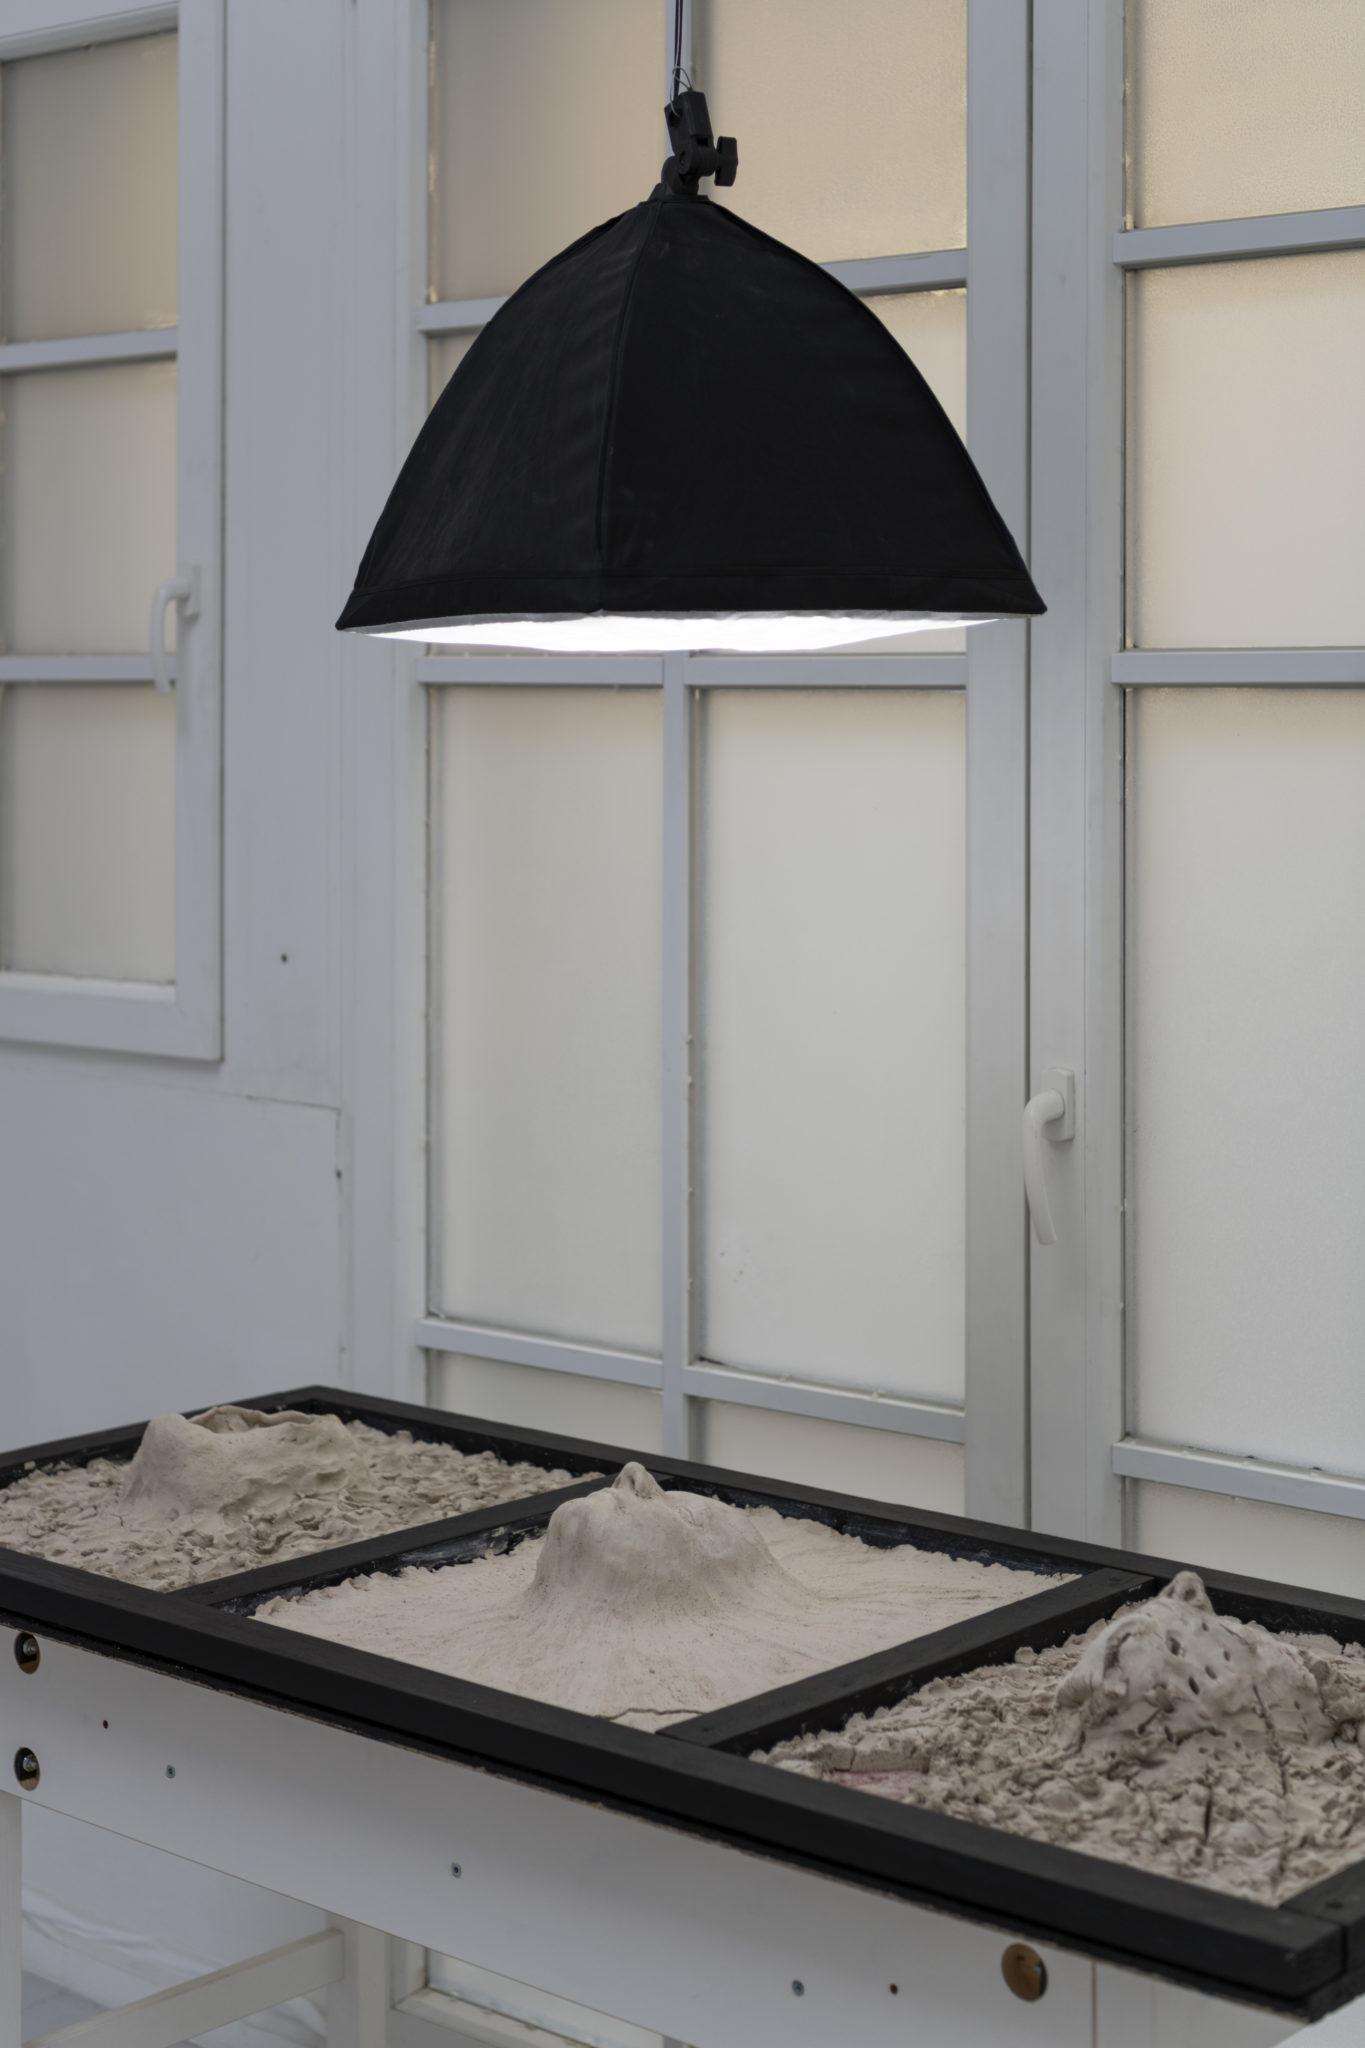 Nathanael Uhlig, Express Emotions, Ausstellungsansicht 61×151×20cm,2021,